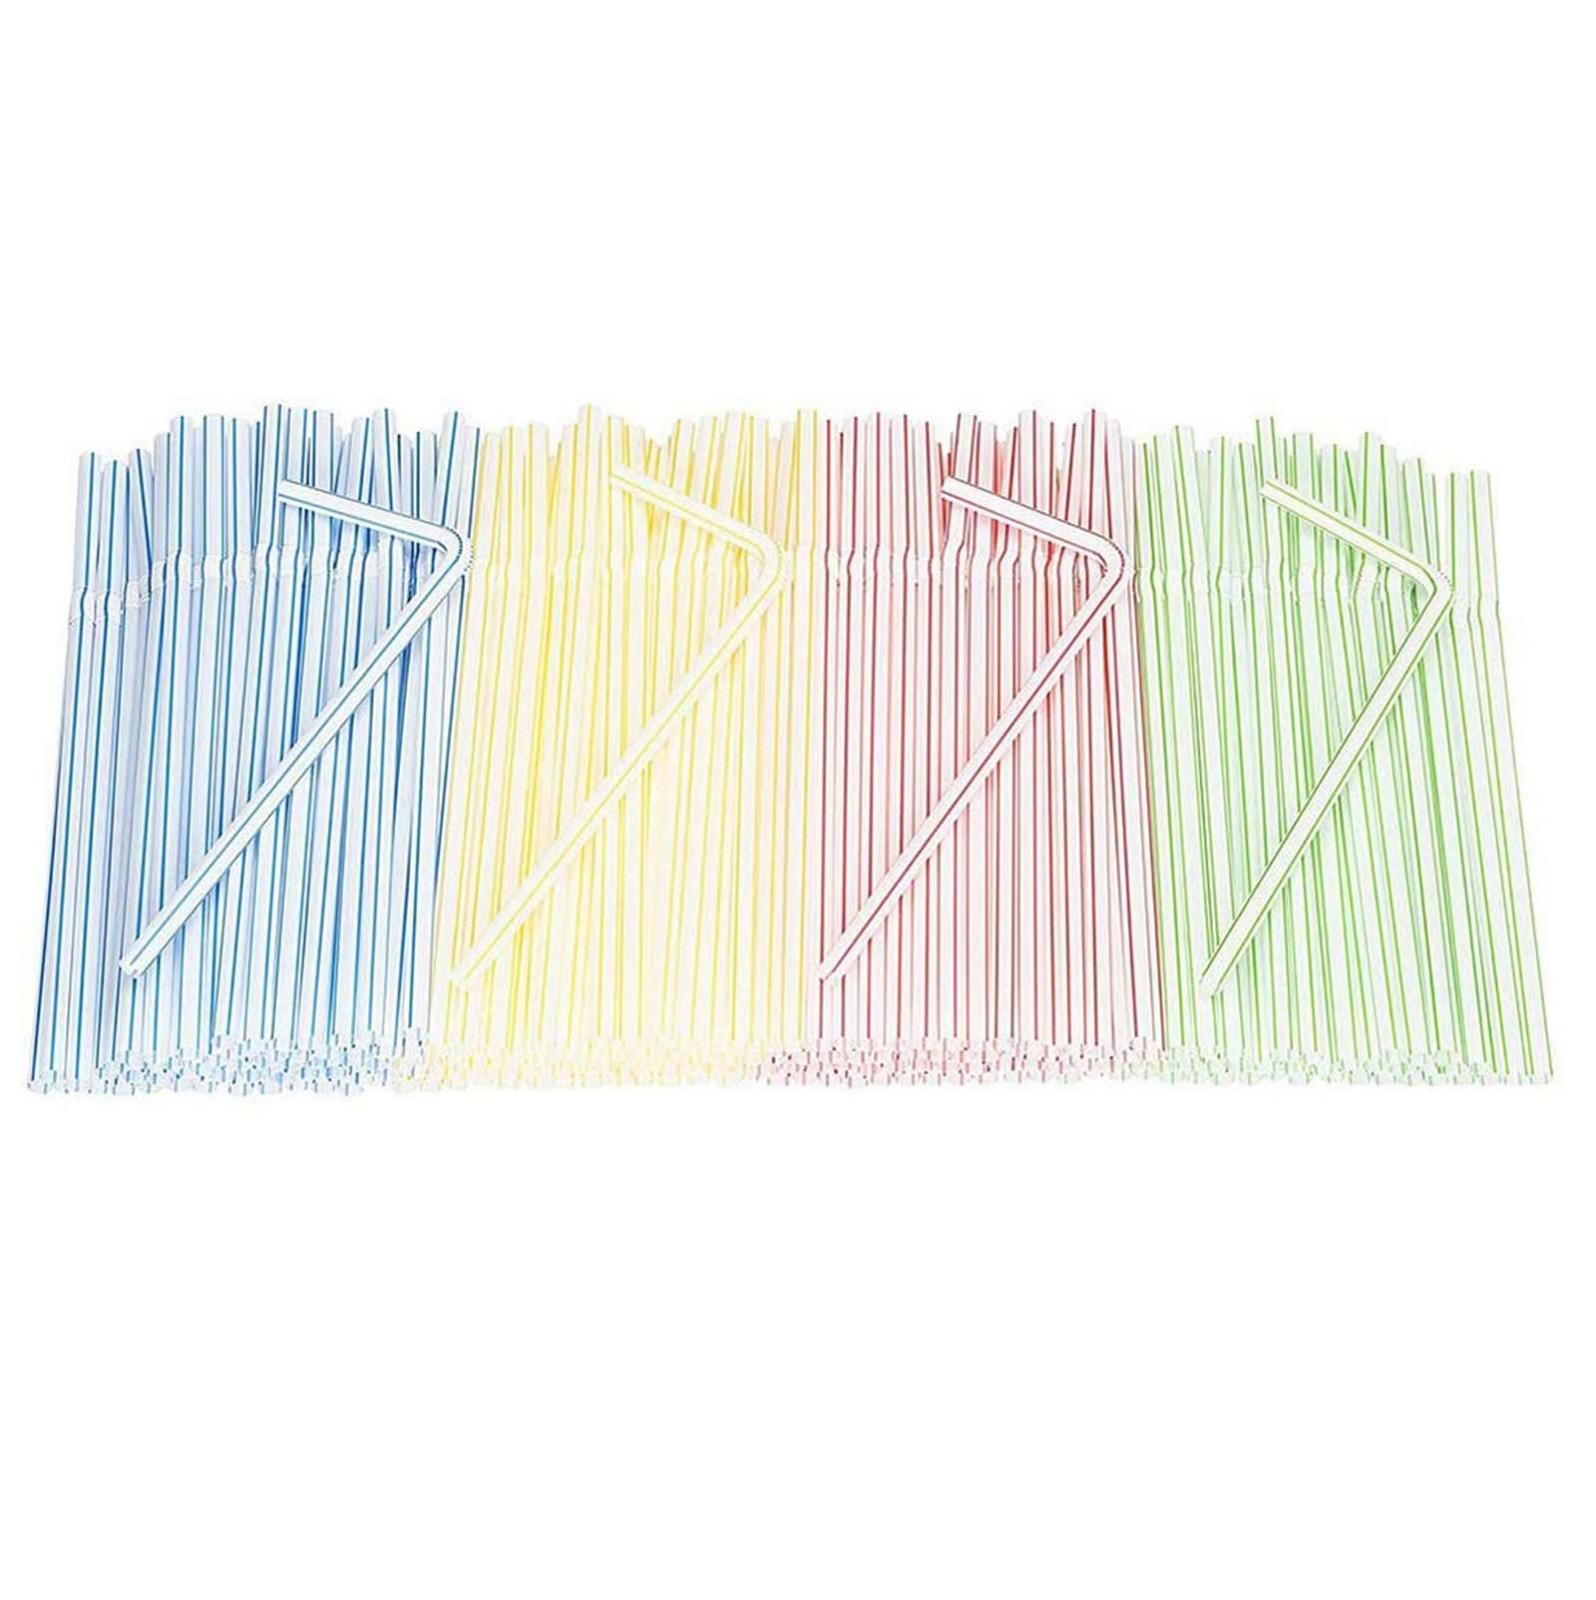 300 Pack Disposable Straws Flexible Plastic Straws Drinking Striped Multi Color Rainbow Straws Bendy Straw Bar Accessories #srn